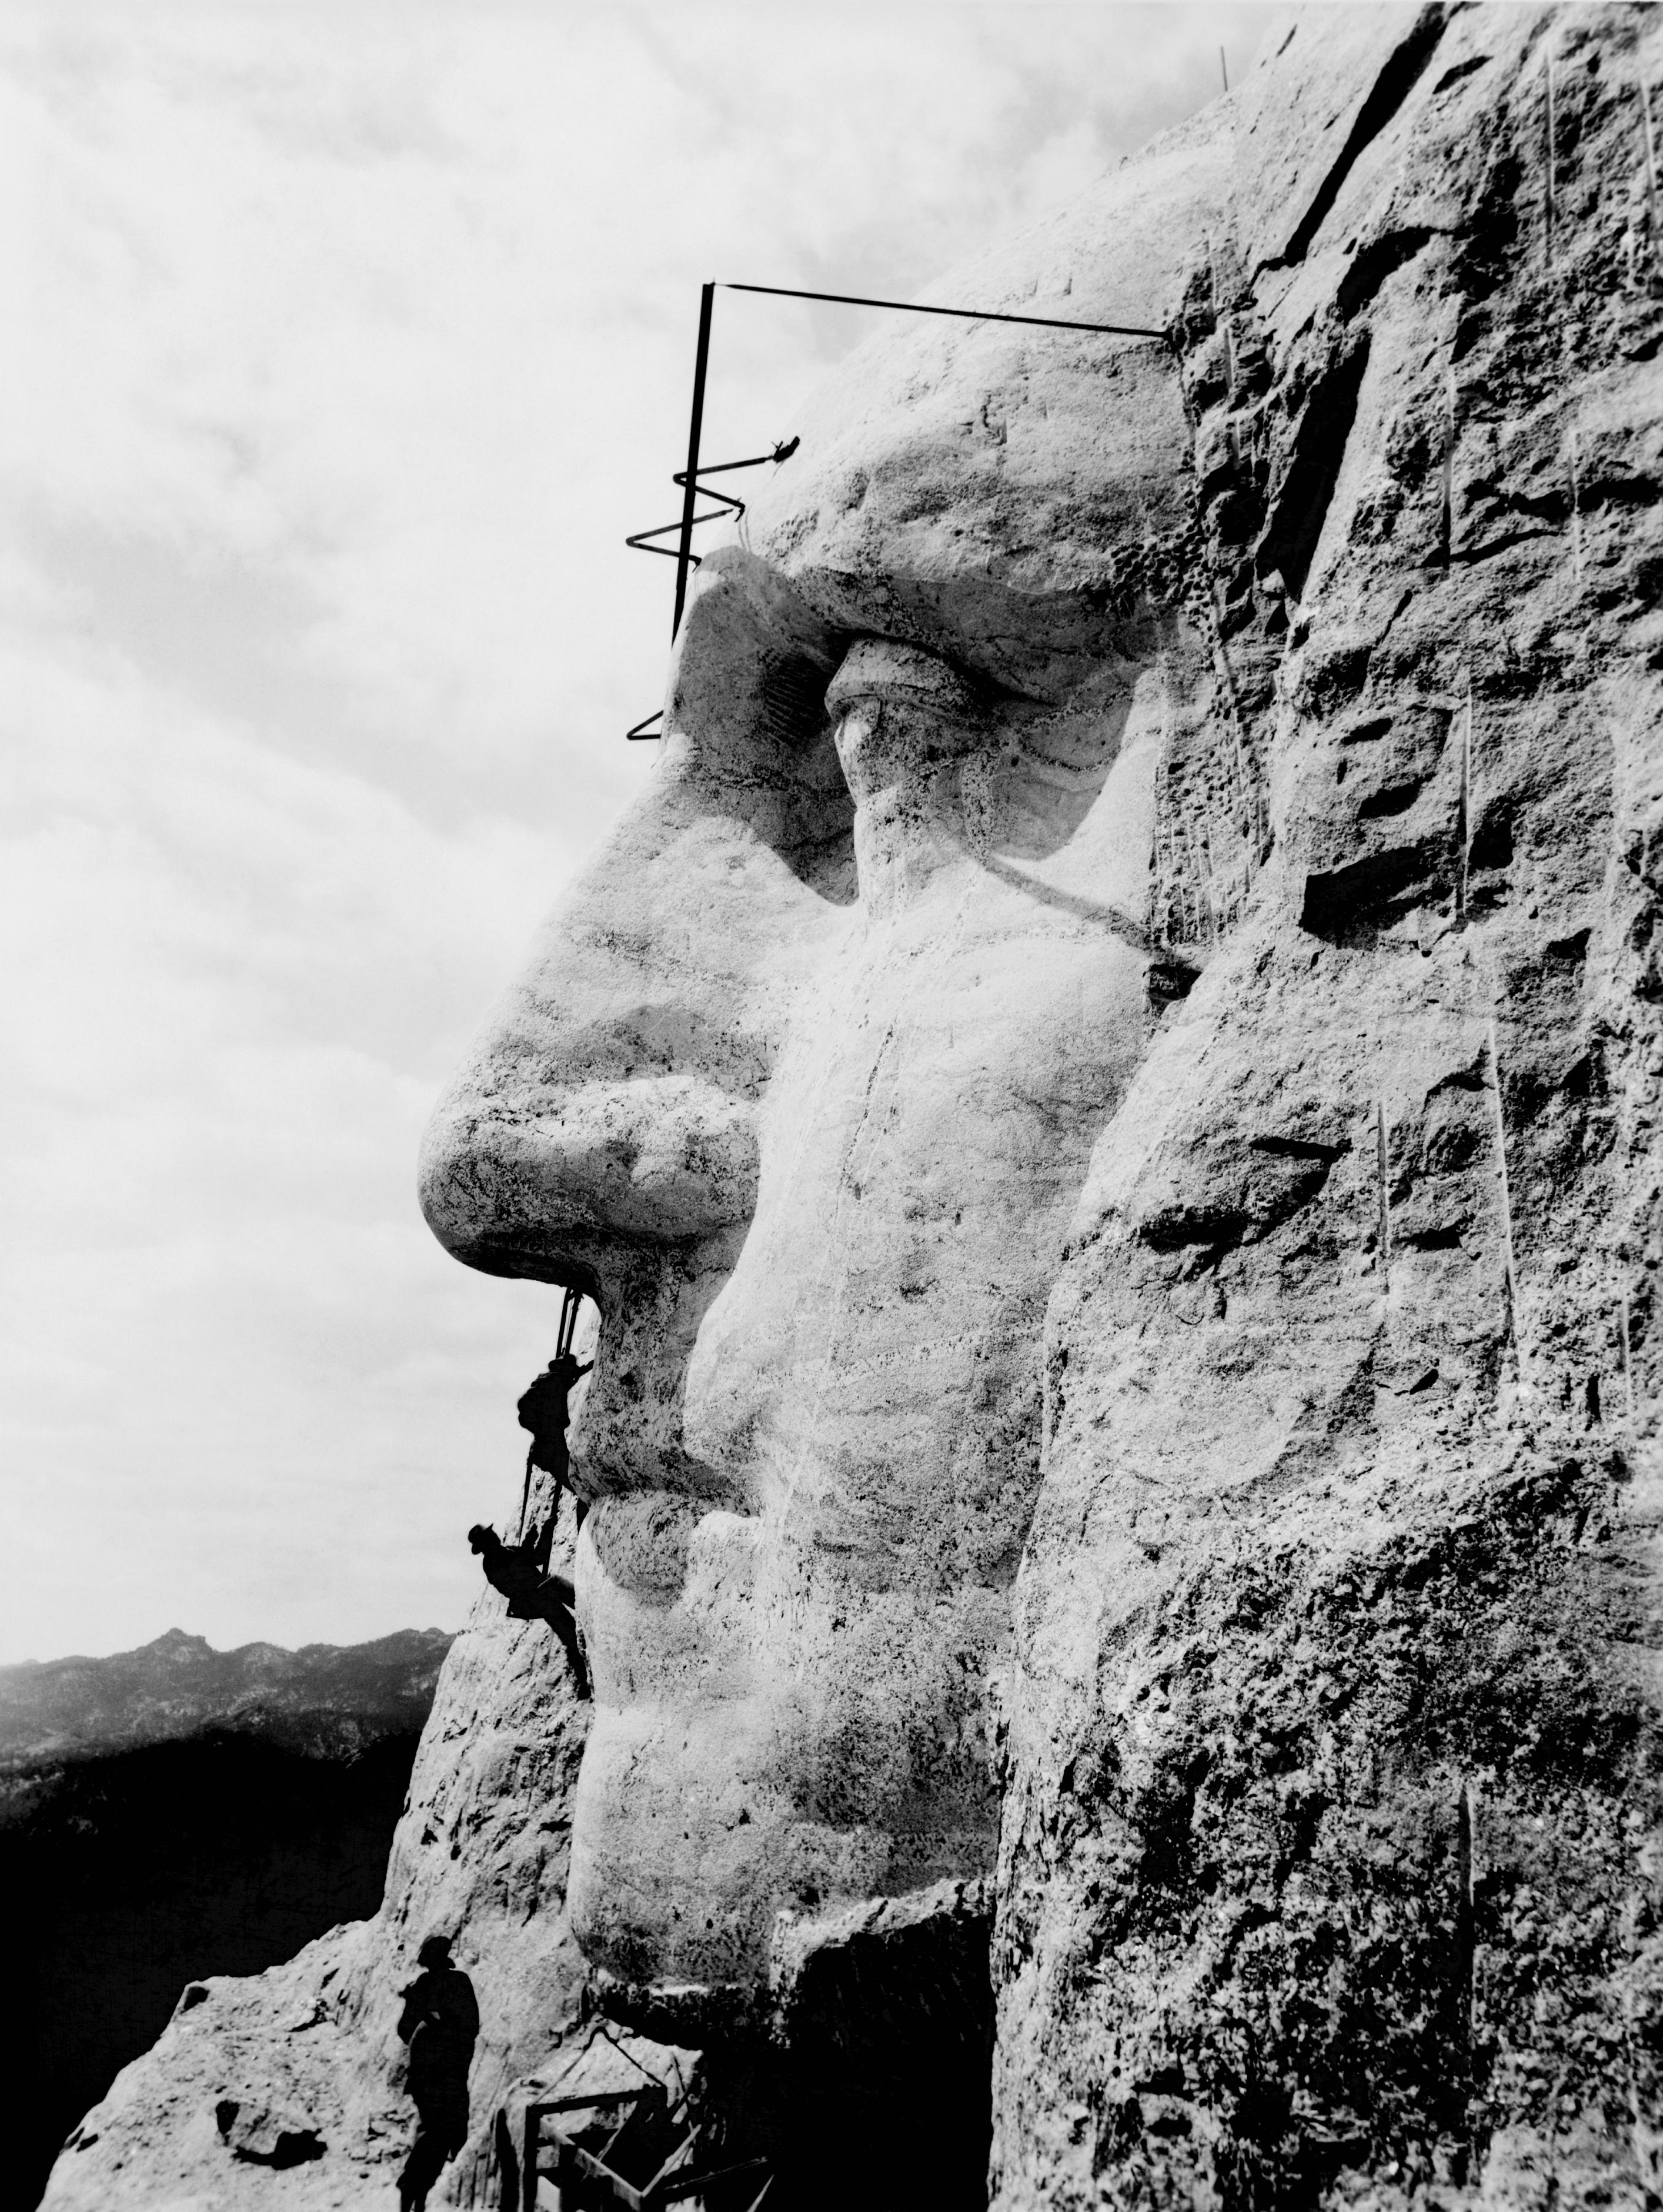 Mount_Rushmore2